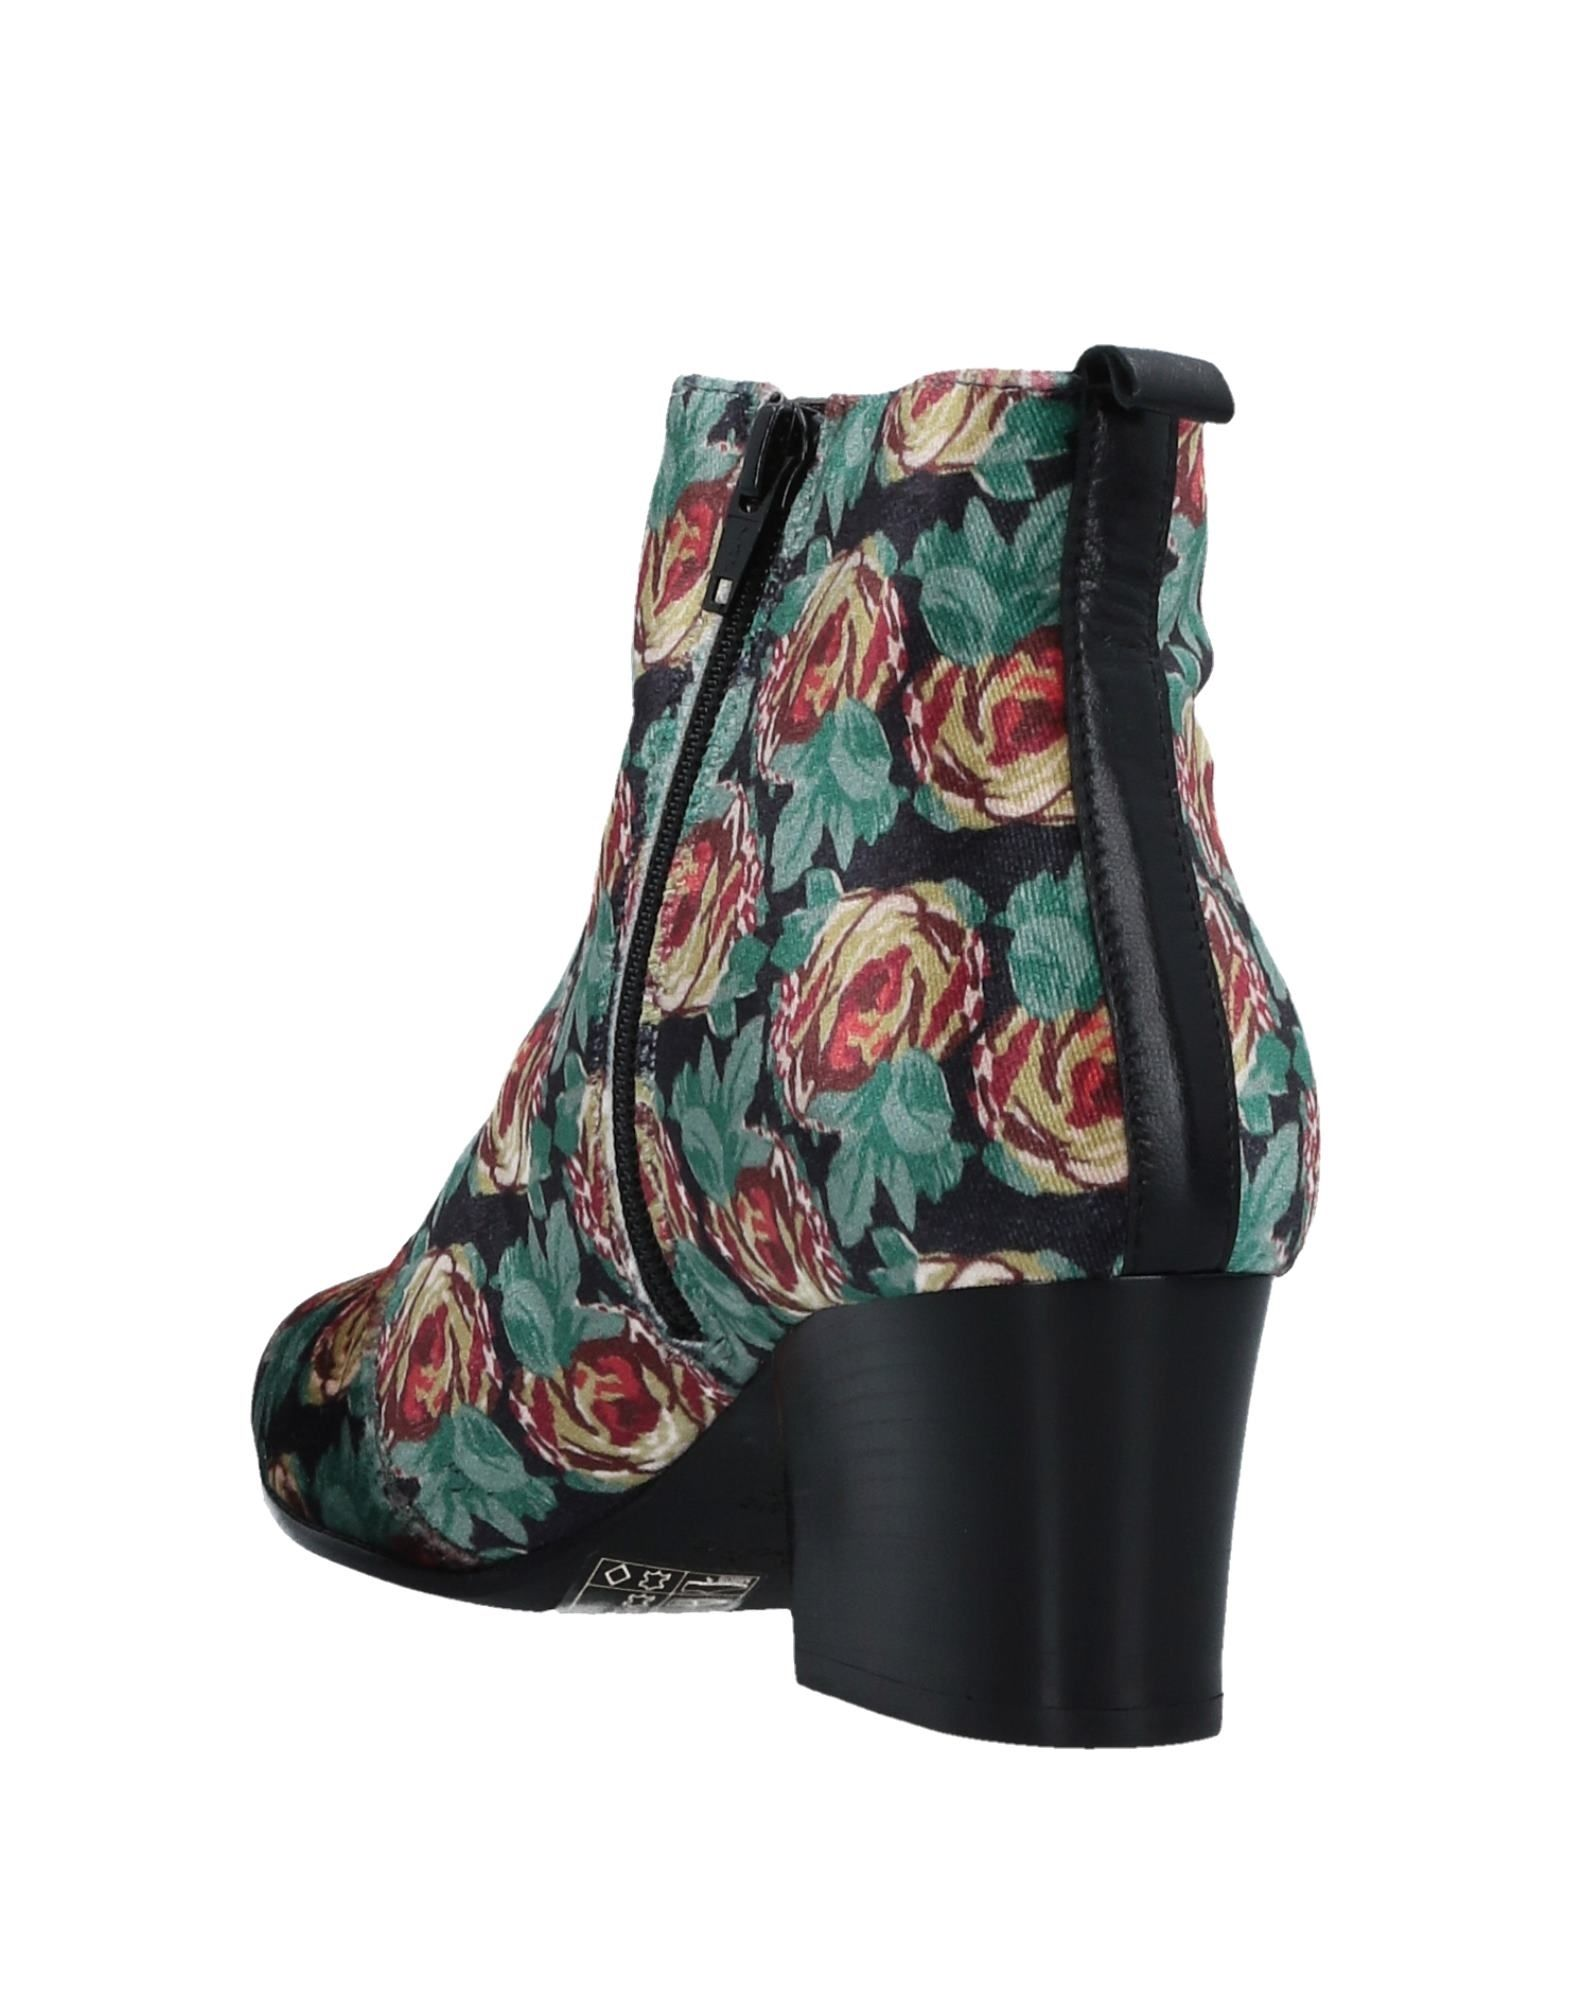 Lisa Corti 11285348QS Stiefelette Damen  11285348QS Corti Neue Schuhe 01e521